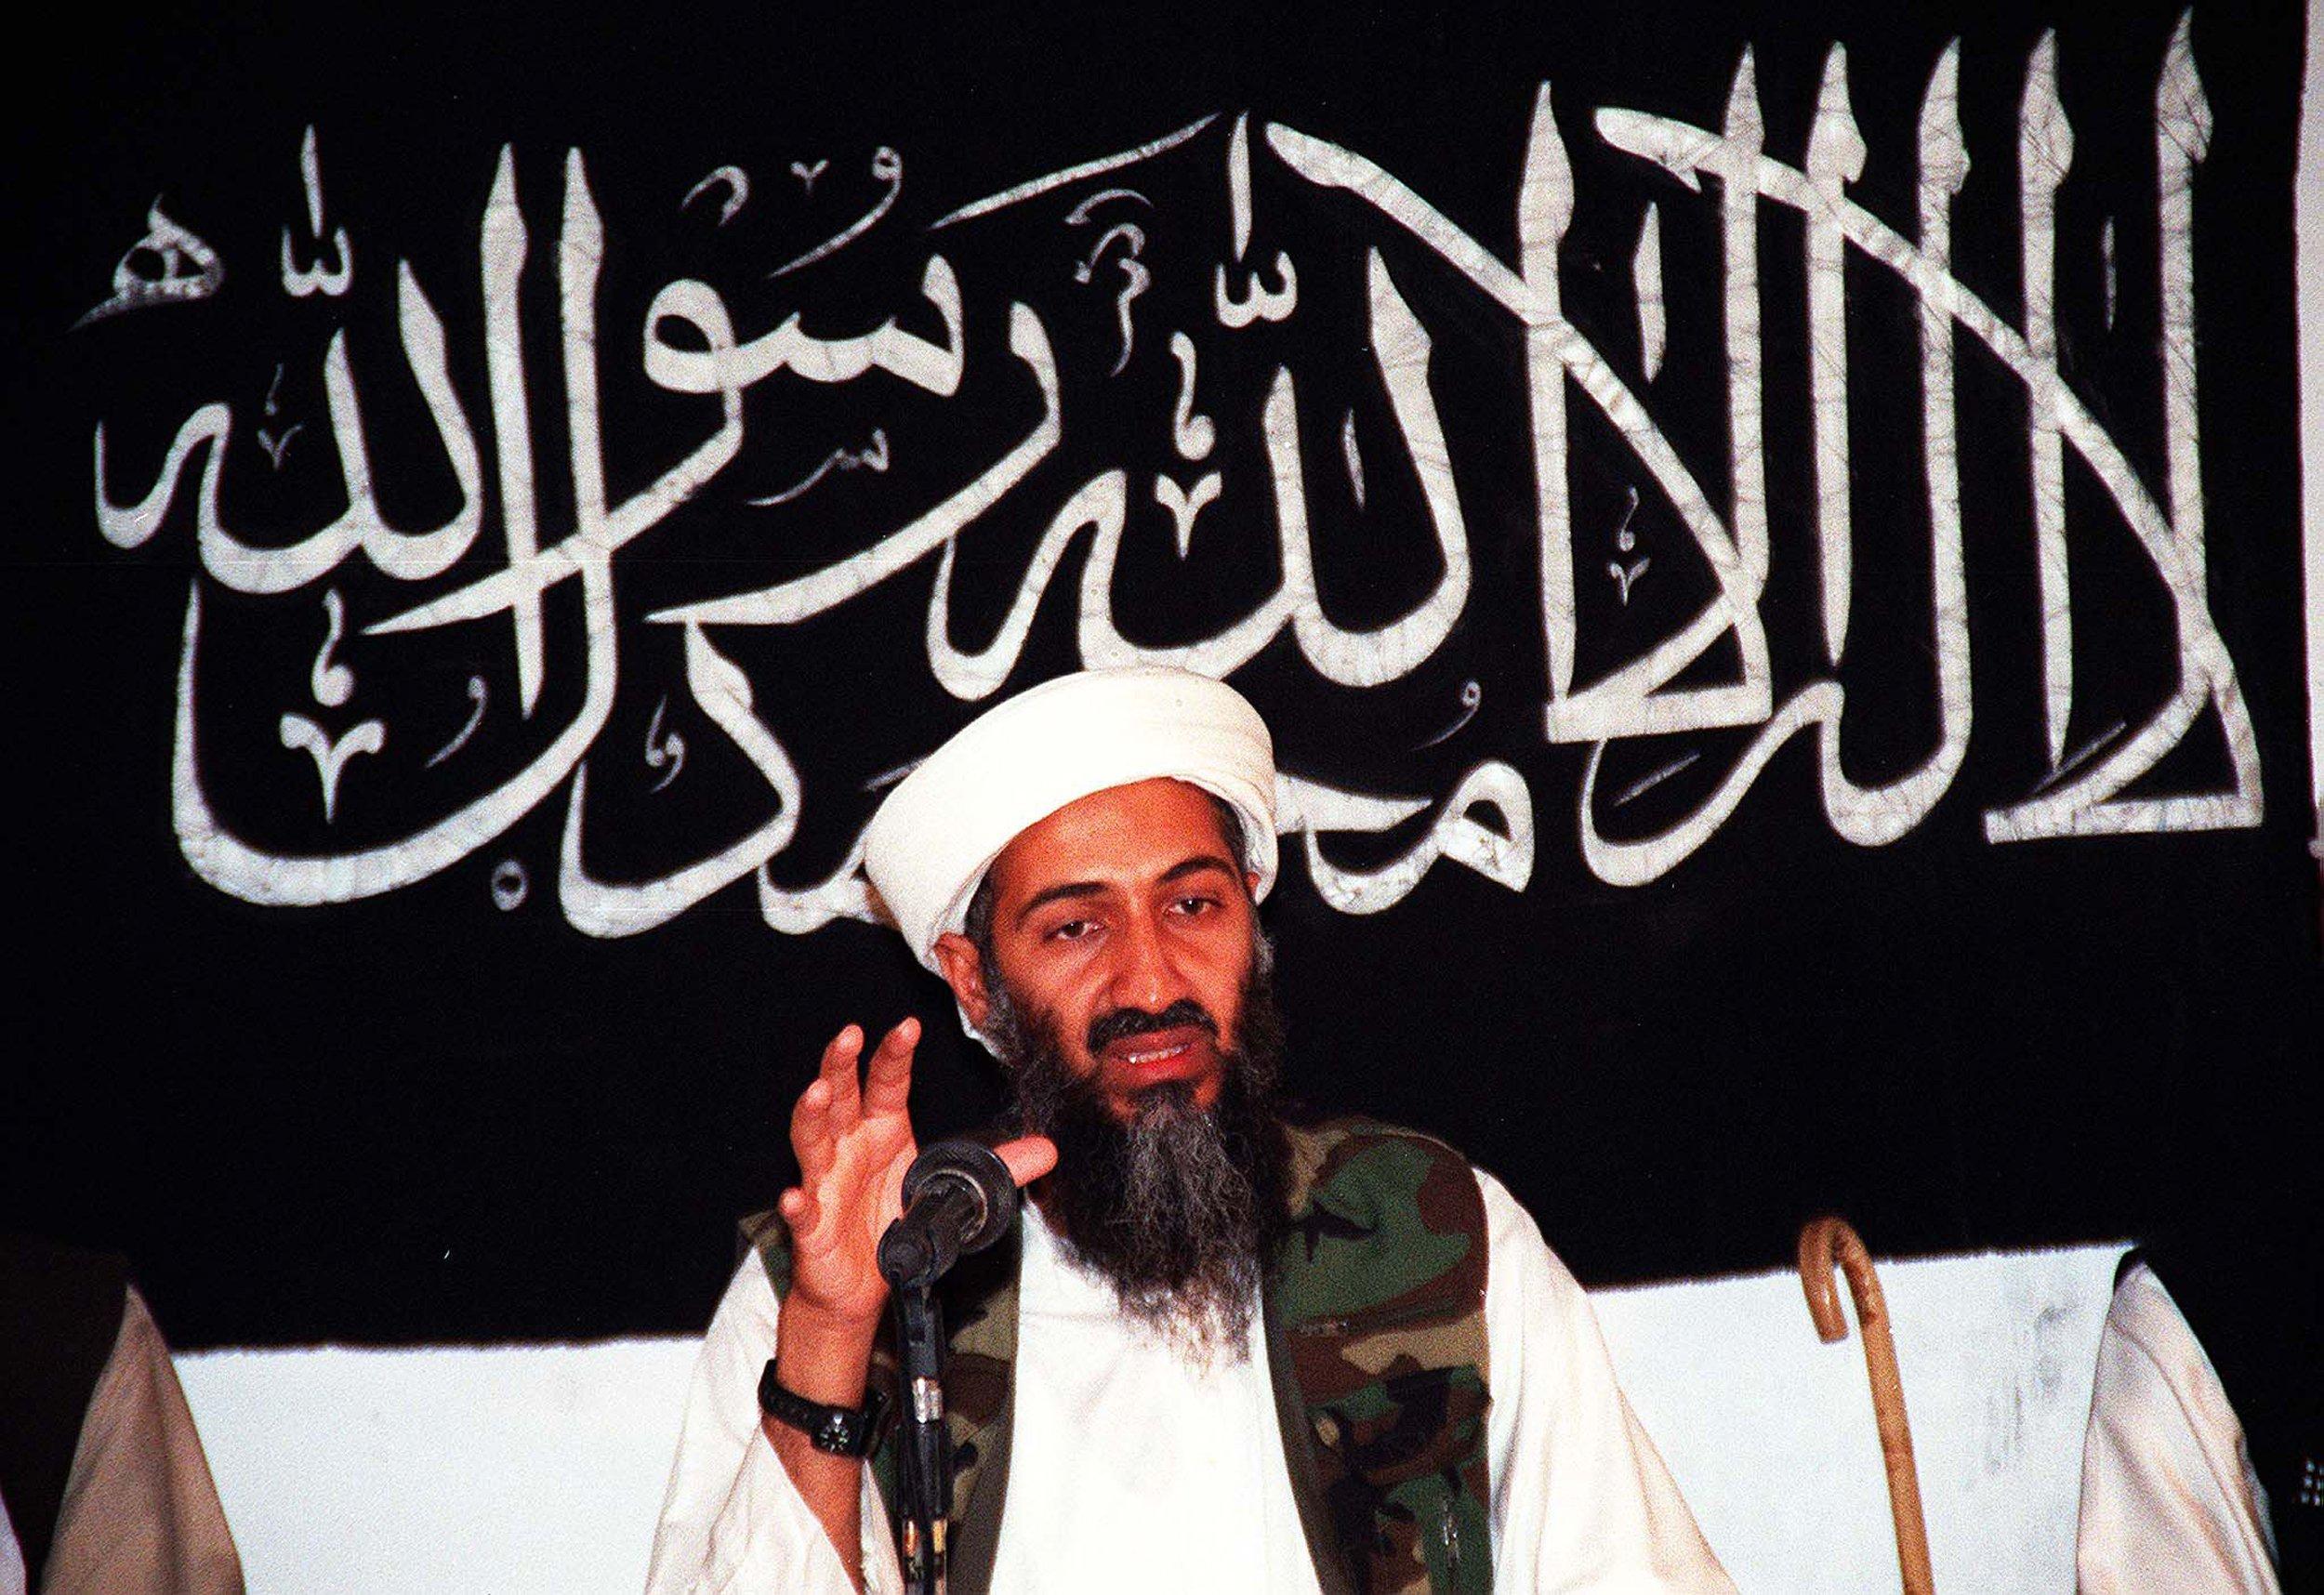 Osama Bin Laden Al-Qaeda ISIS Islamic State Middle East